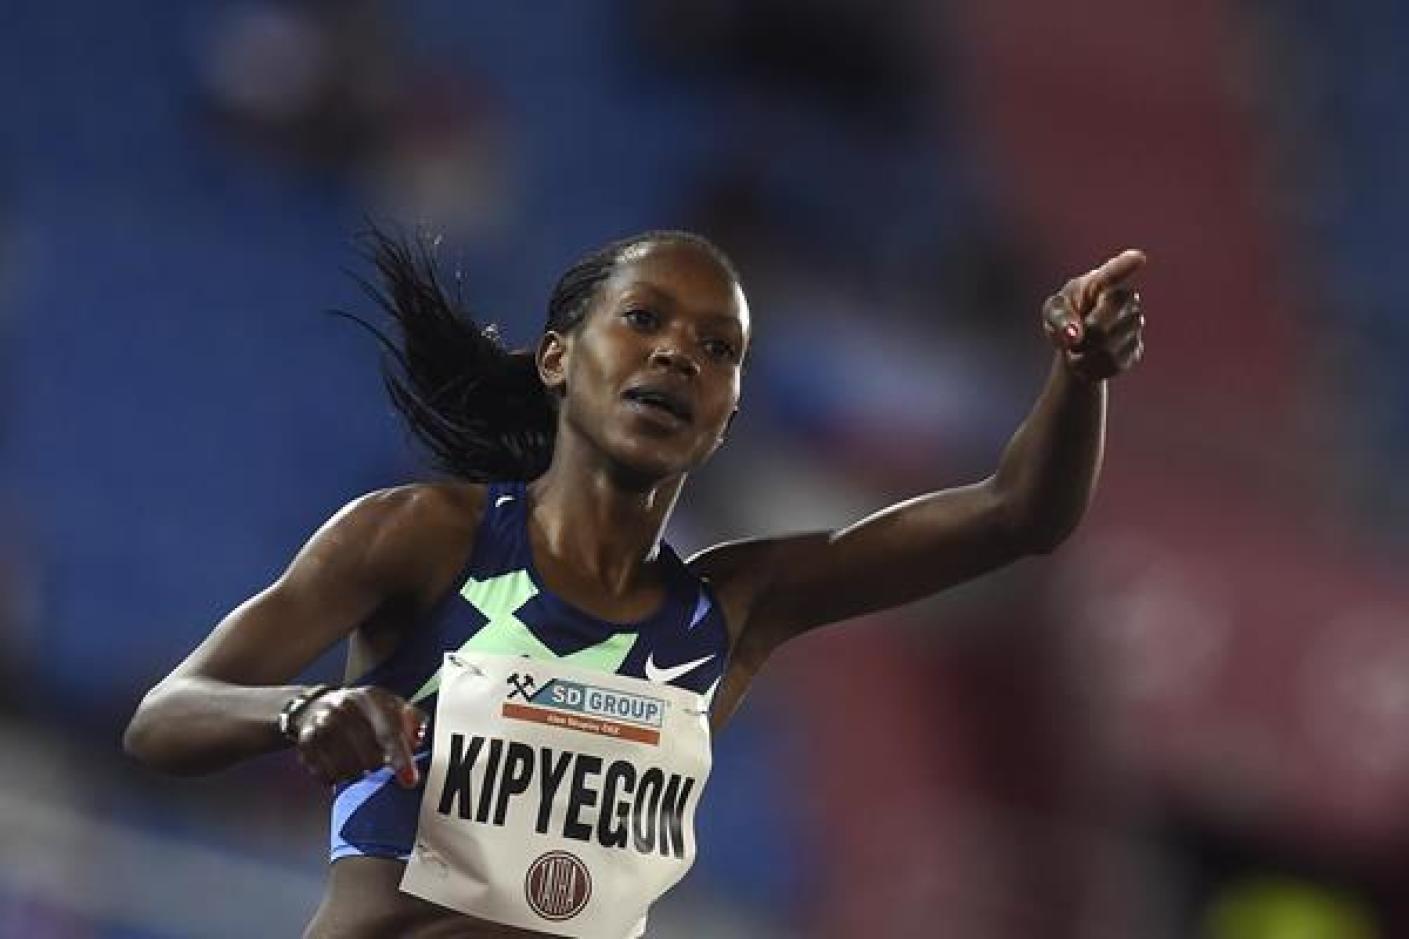 Faith Kipyegon gana los 1500m en Ostrava (AFP / Getty Images)